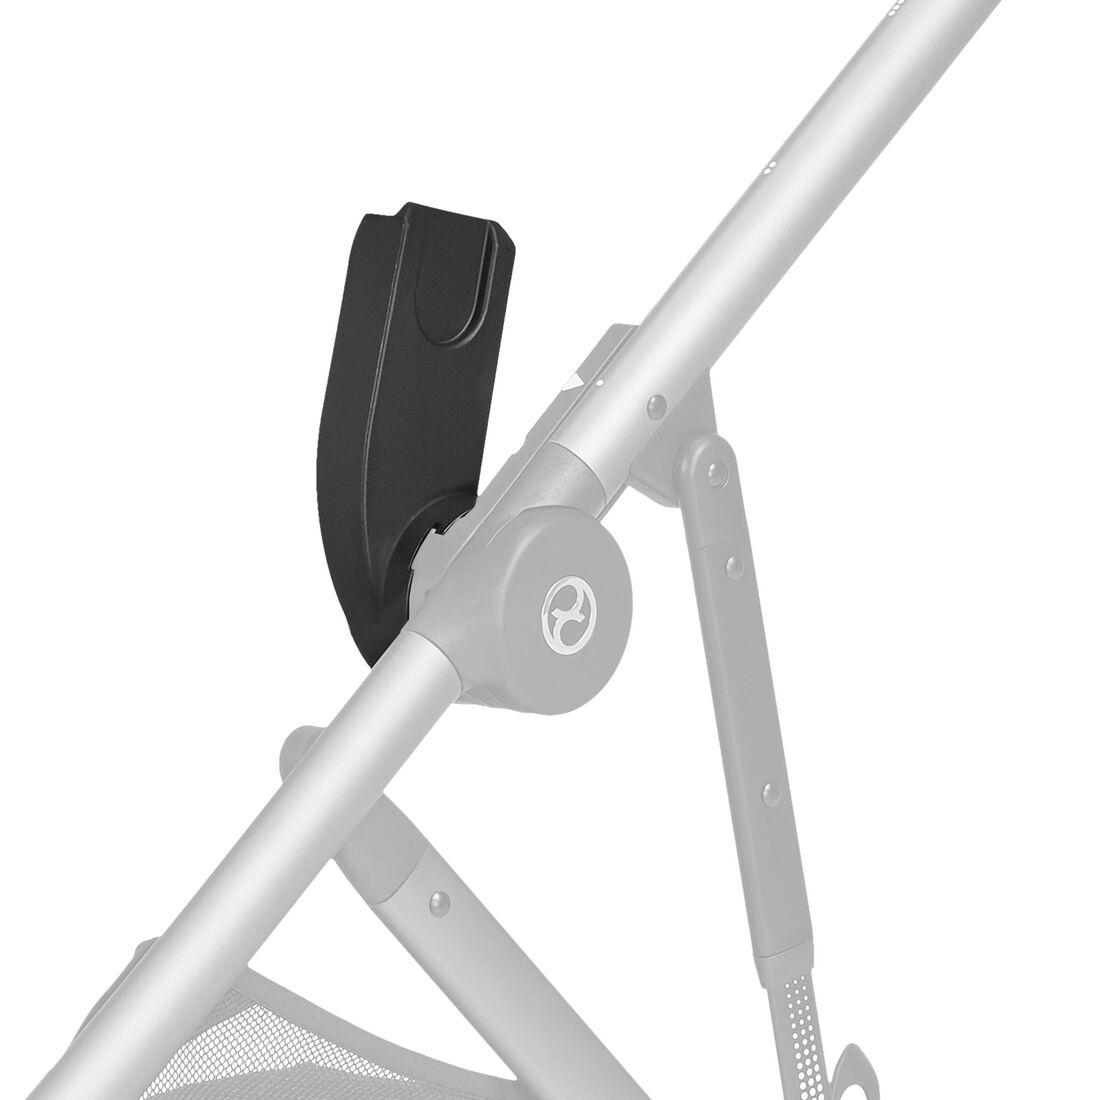 CYBEX Babyschalen Adapter Gazelle S - Black in  large Bild 2